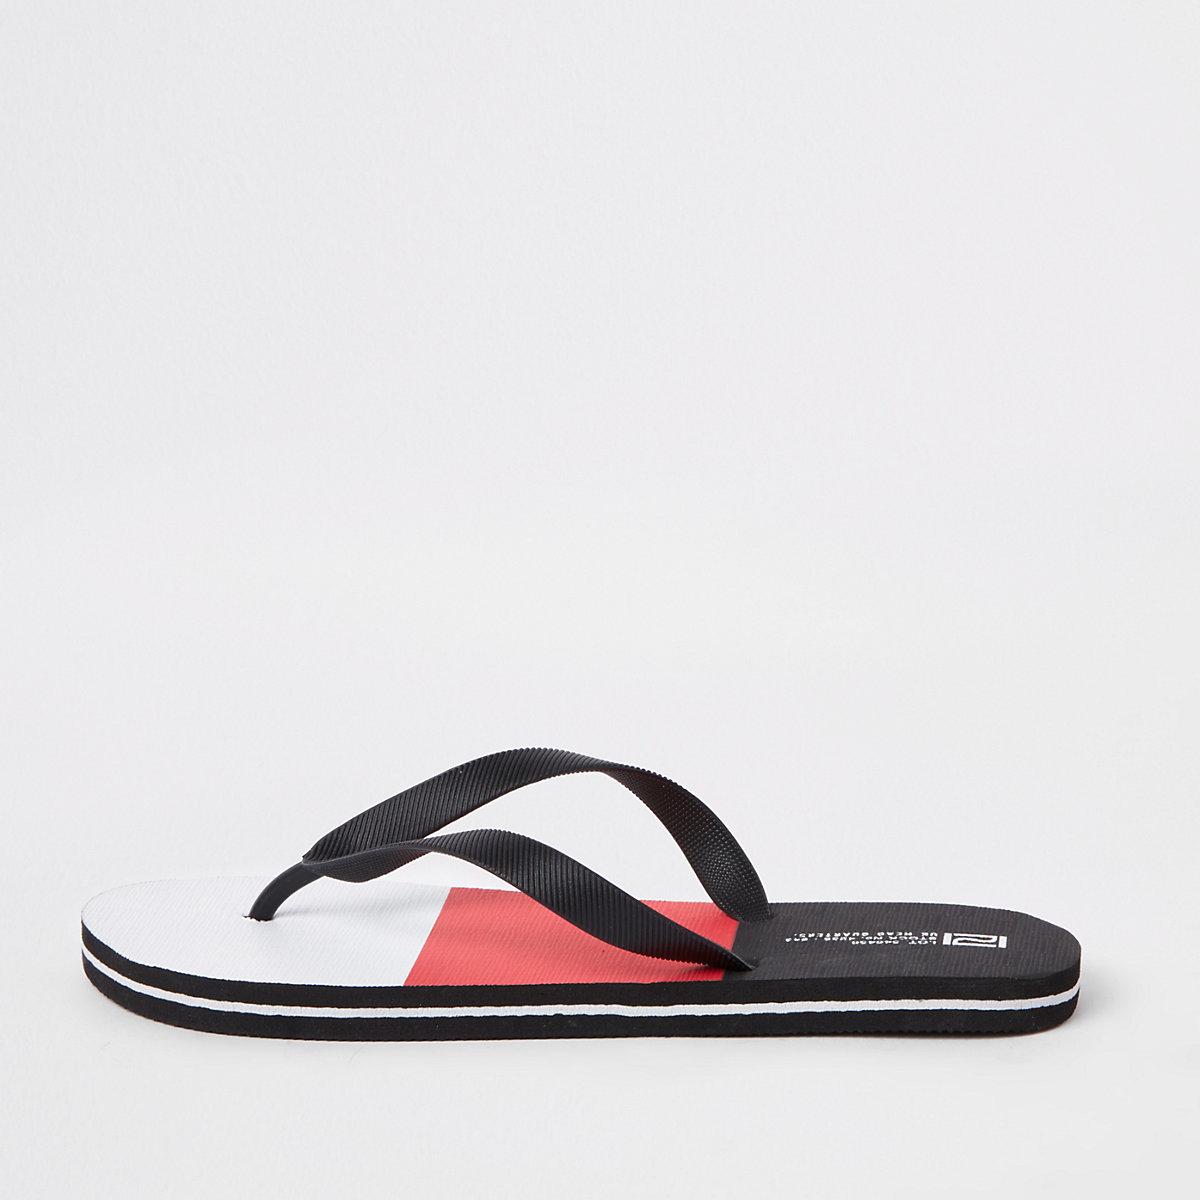 Red color block flip flops